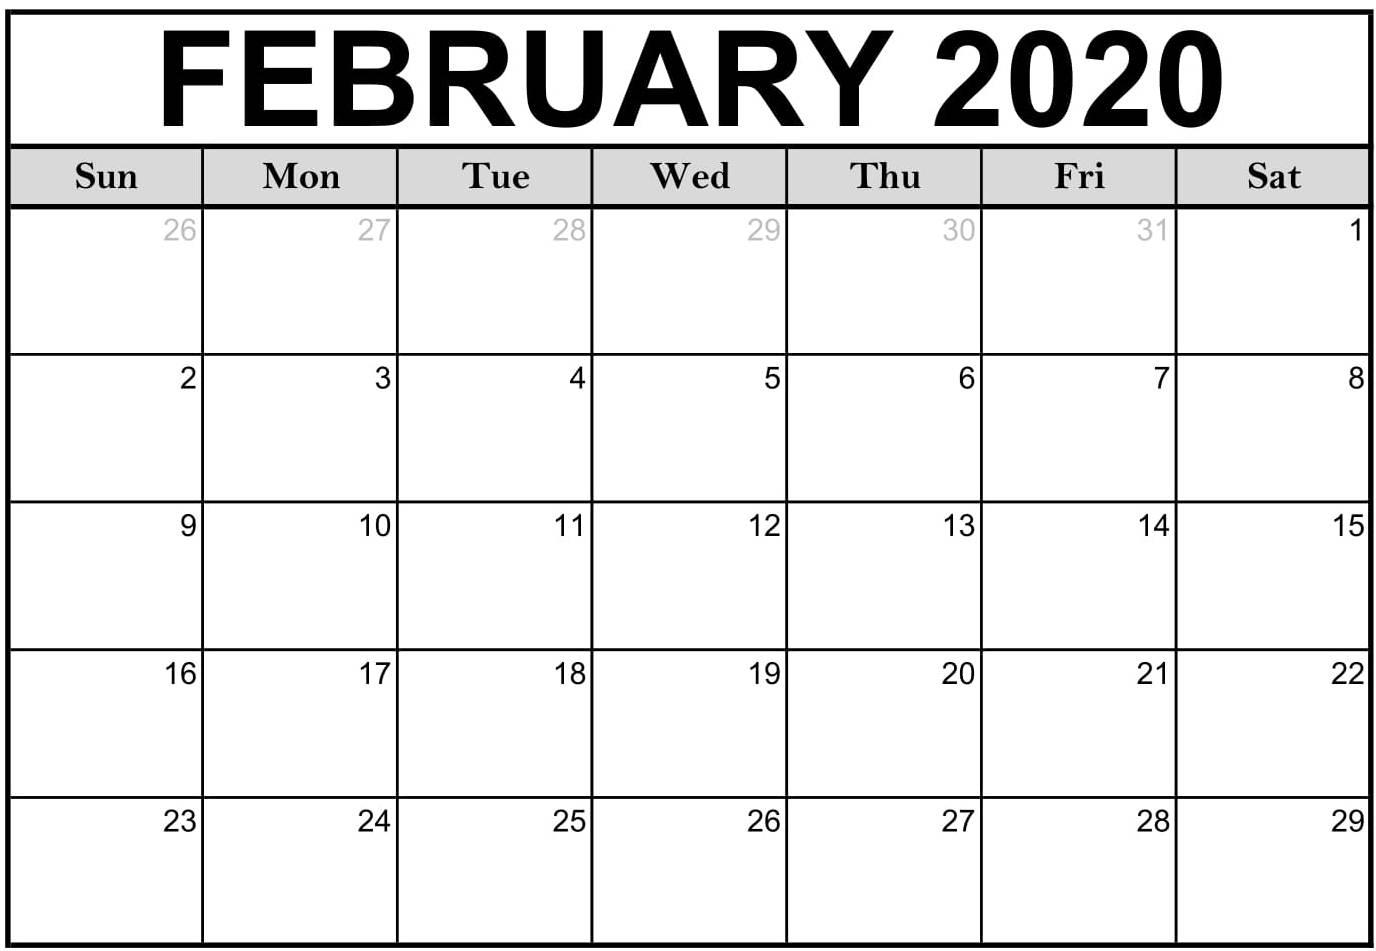 Free Printable February Calendar 2020 Pdf Sheet - Set Your